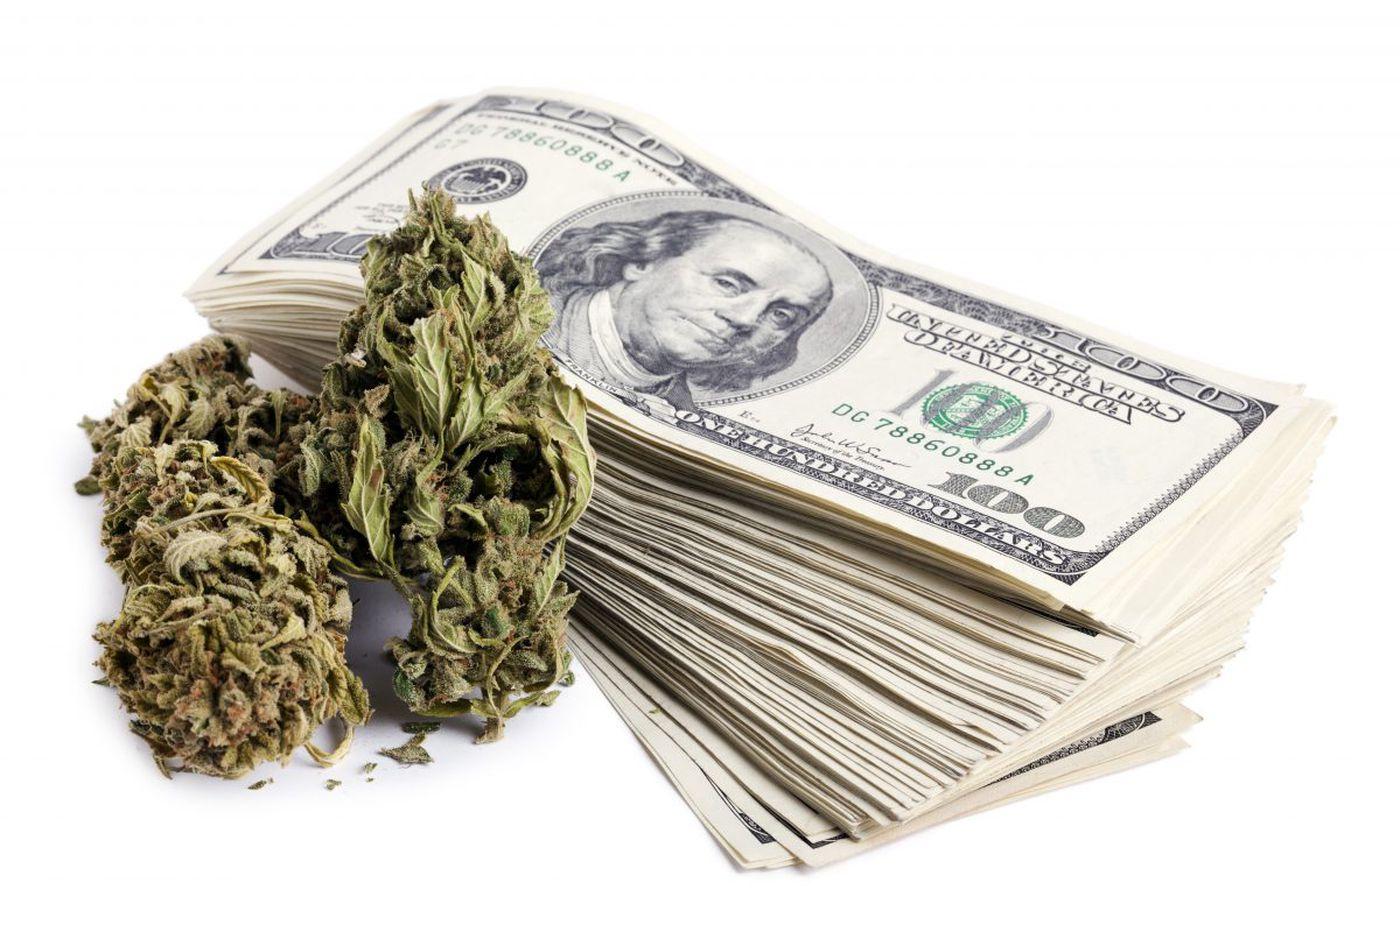 Judge grants temporary injunction in Pa. medical marijuana case